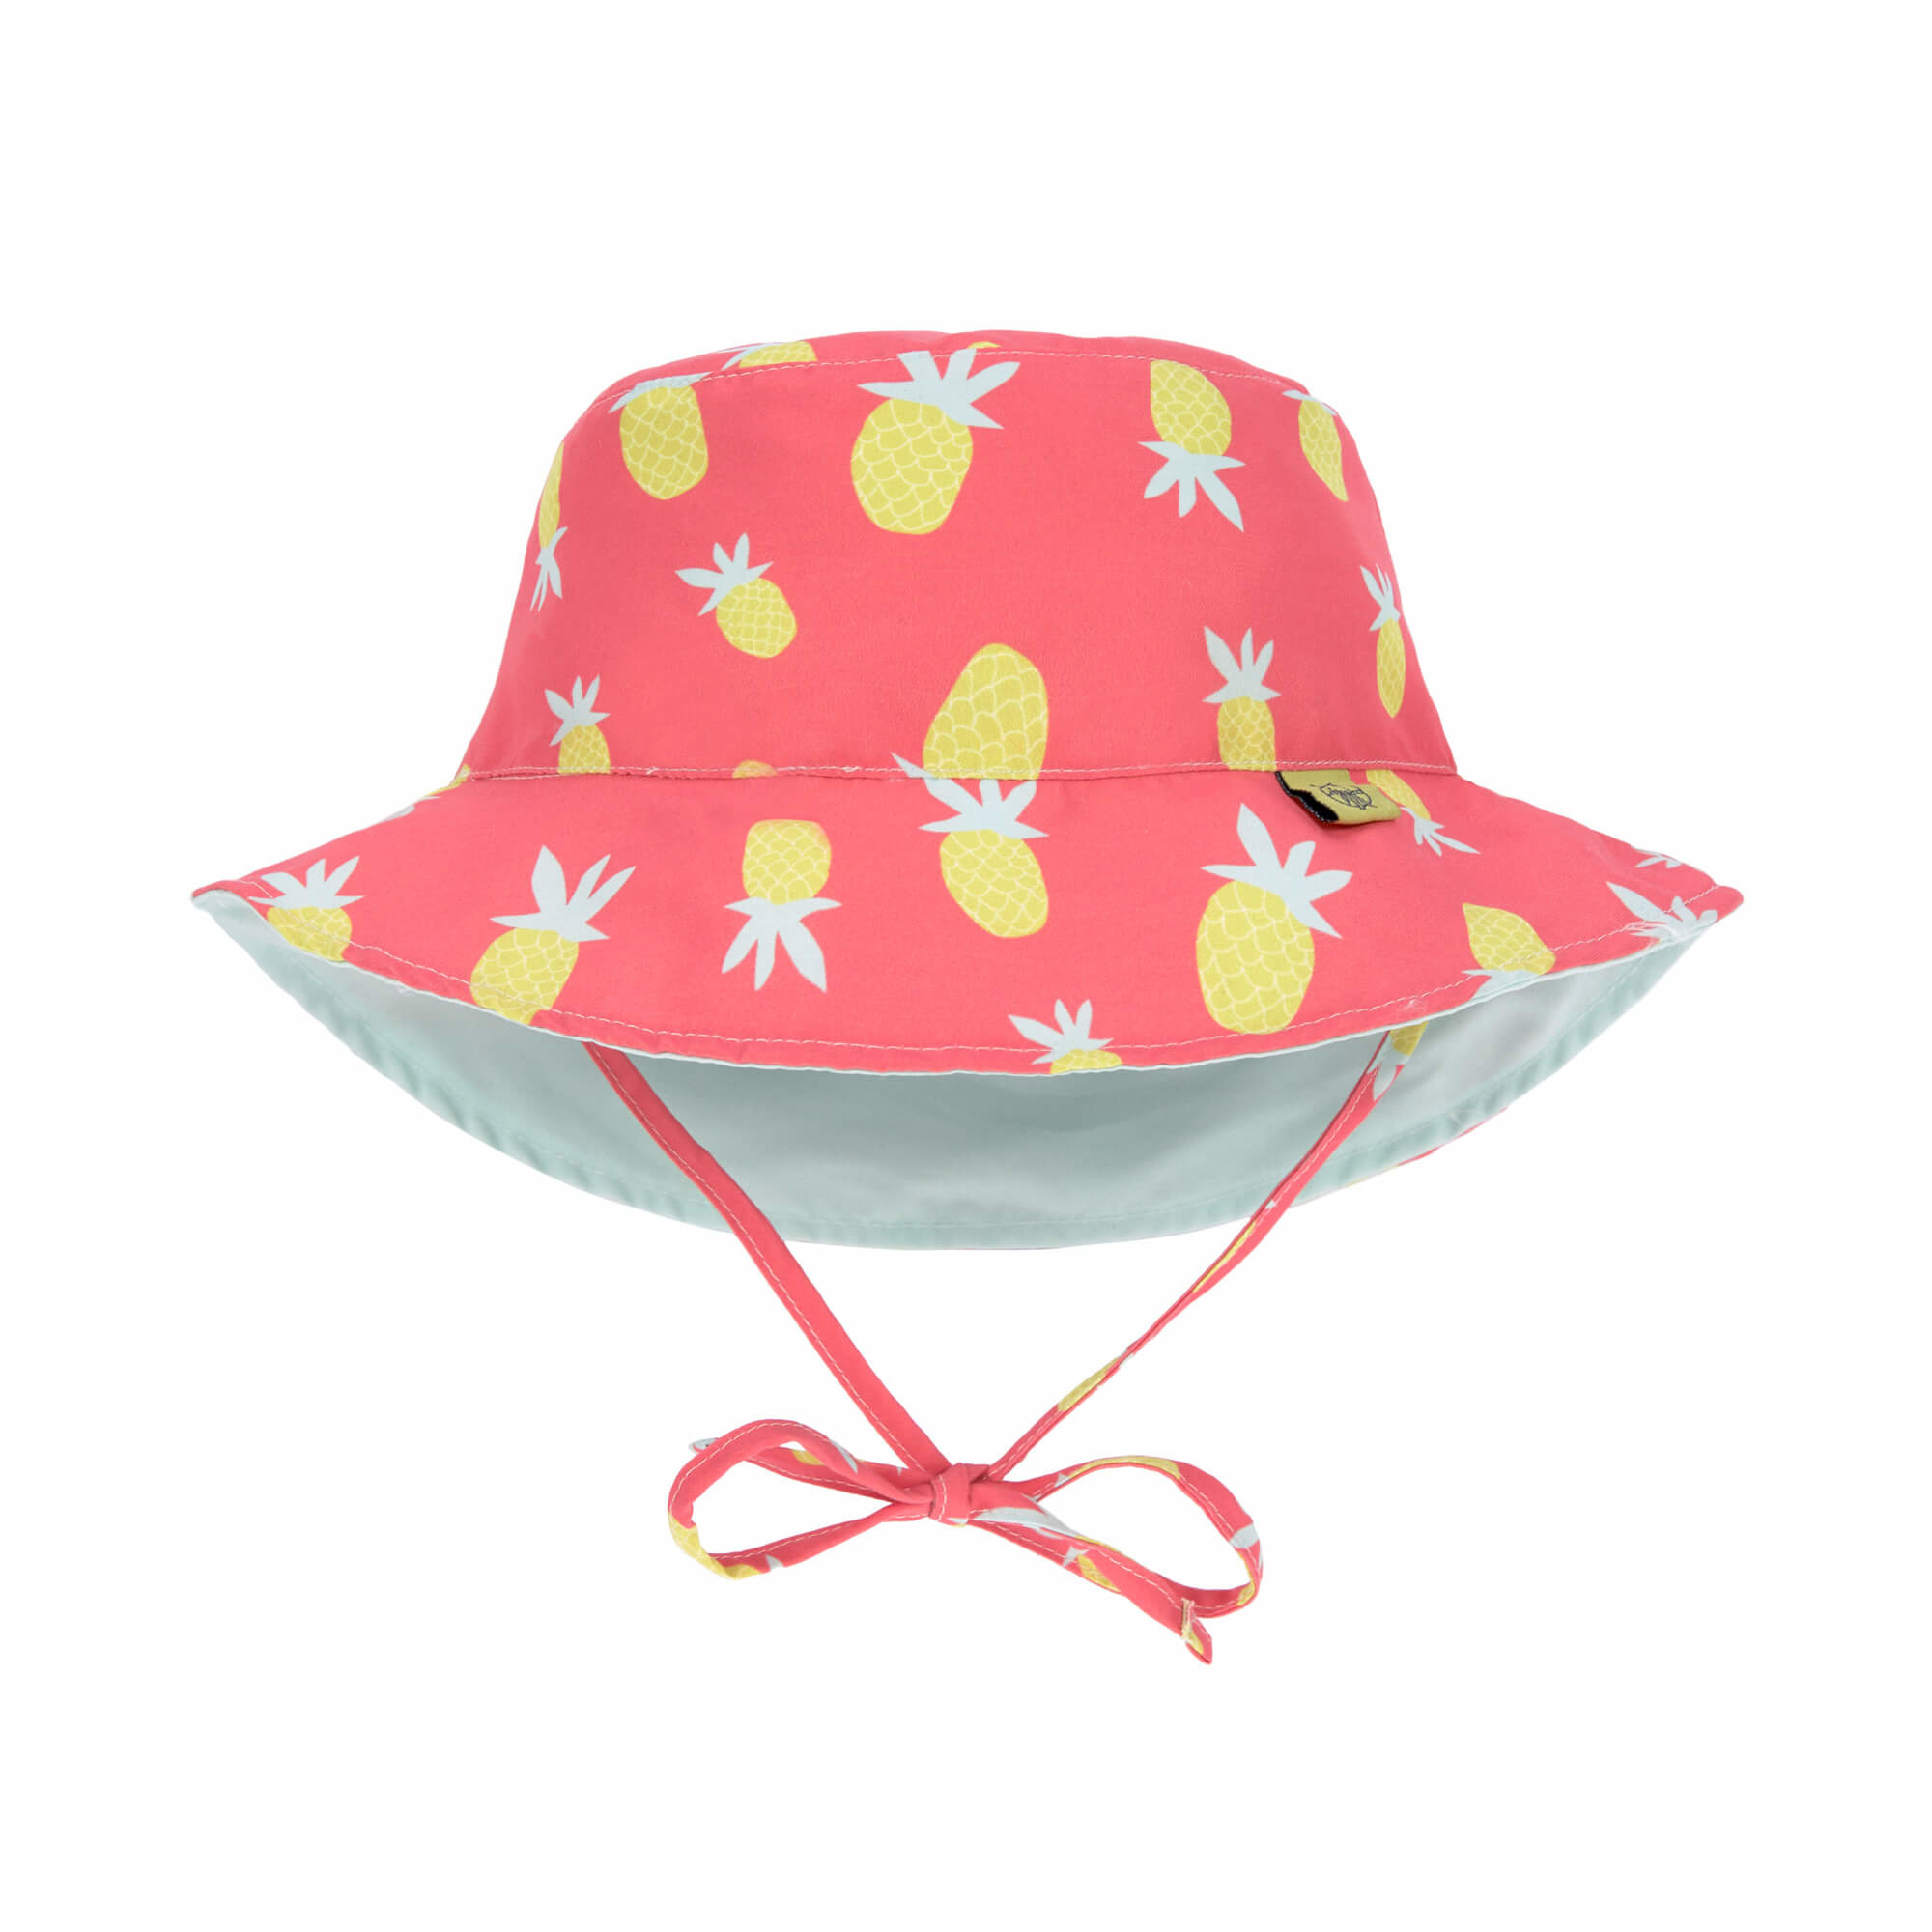 L�ssig L�ssig Splash & Fun Sun Protection Vissershoedje Pineapple 6-18 mnd